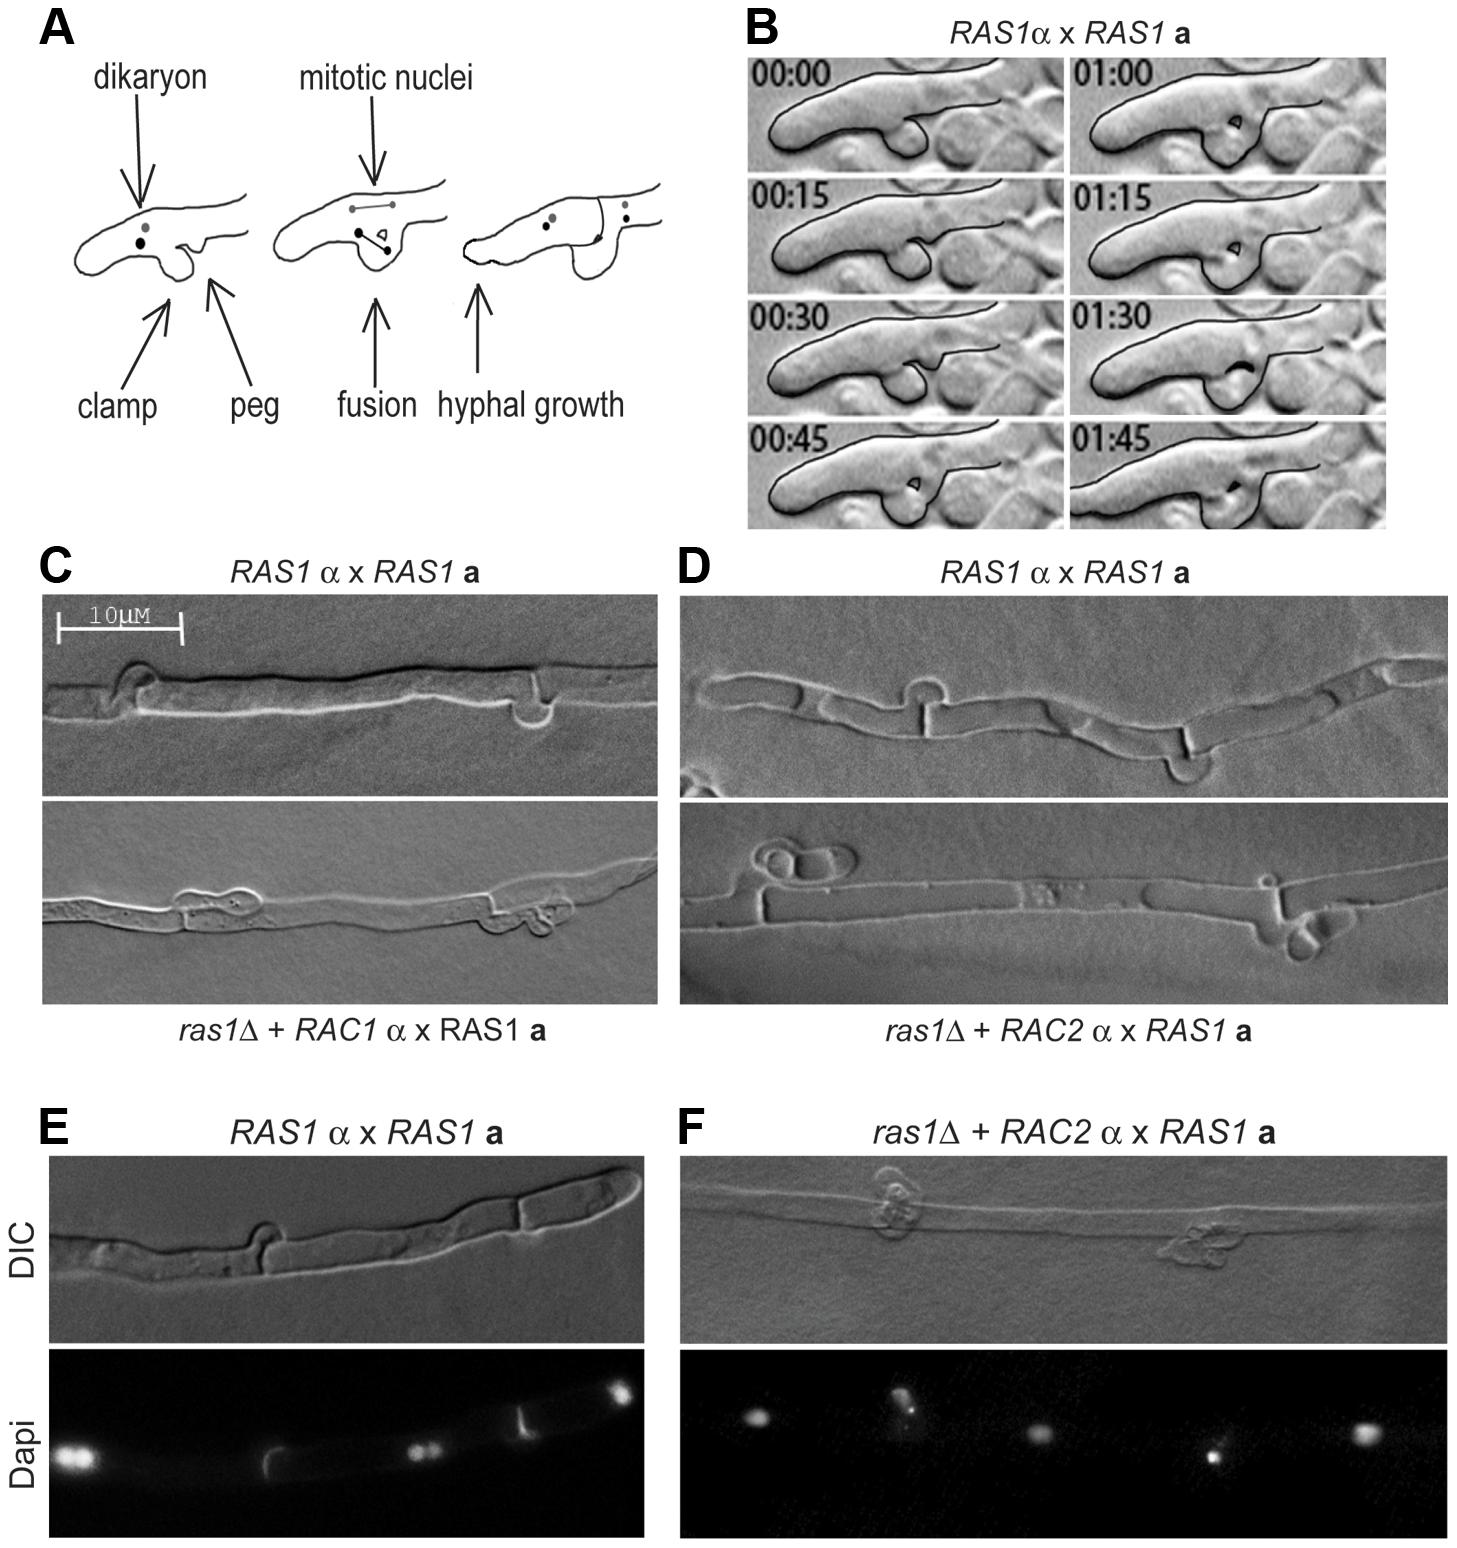 Clamp cell morphogenesis during <i>C. neoformans</i> hyphal development.